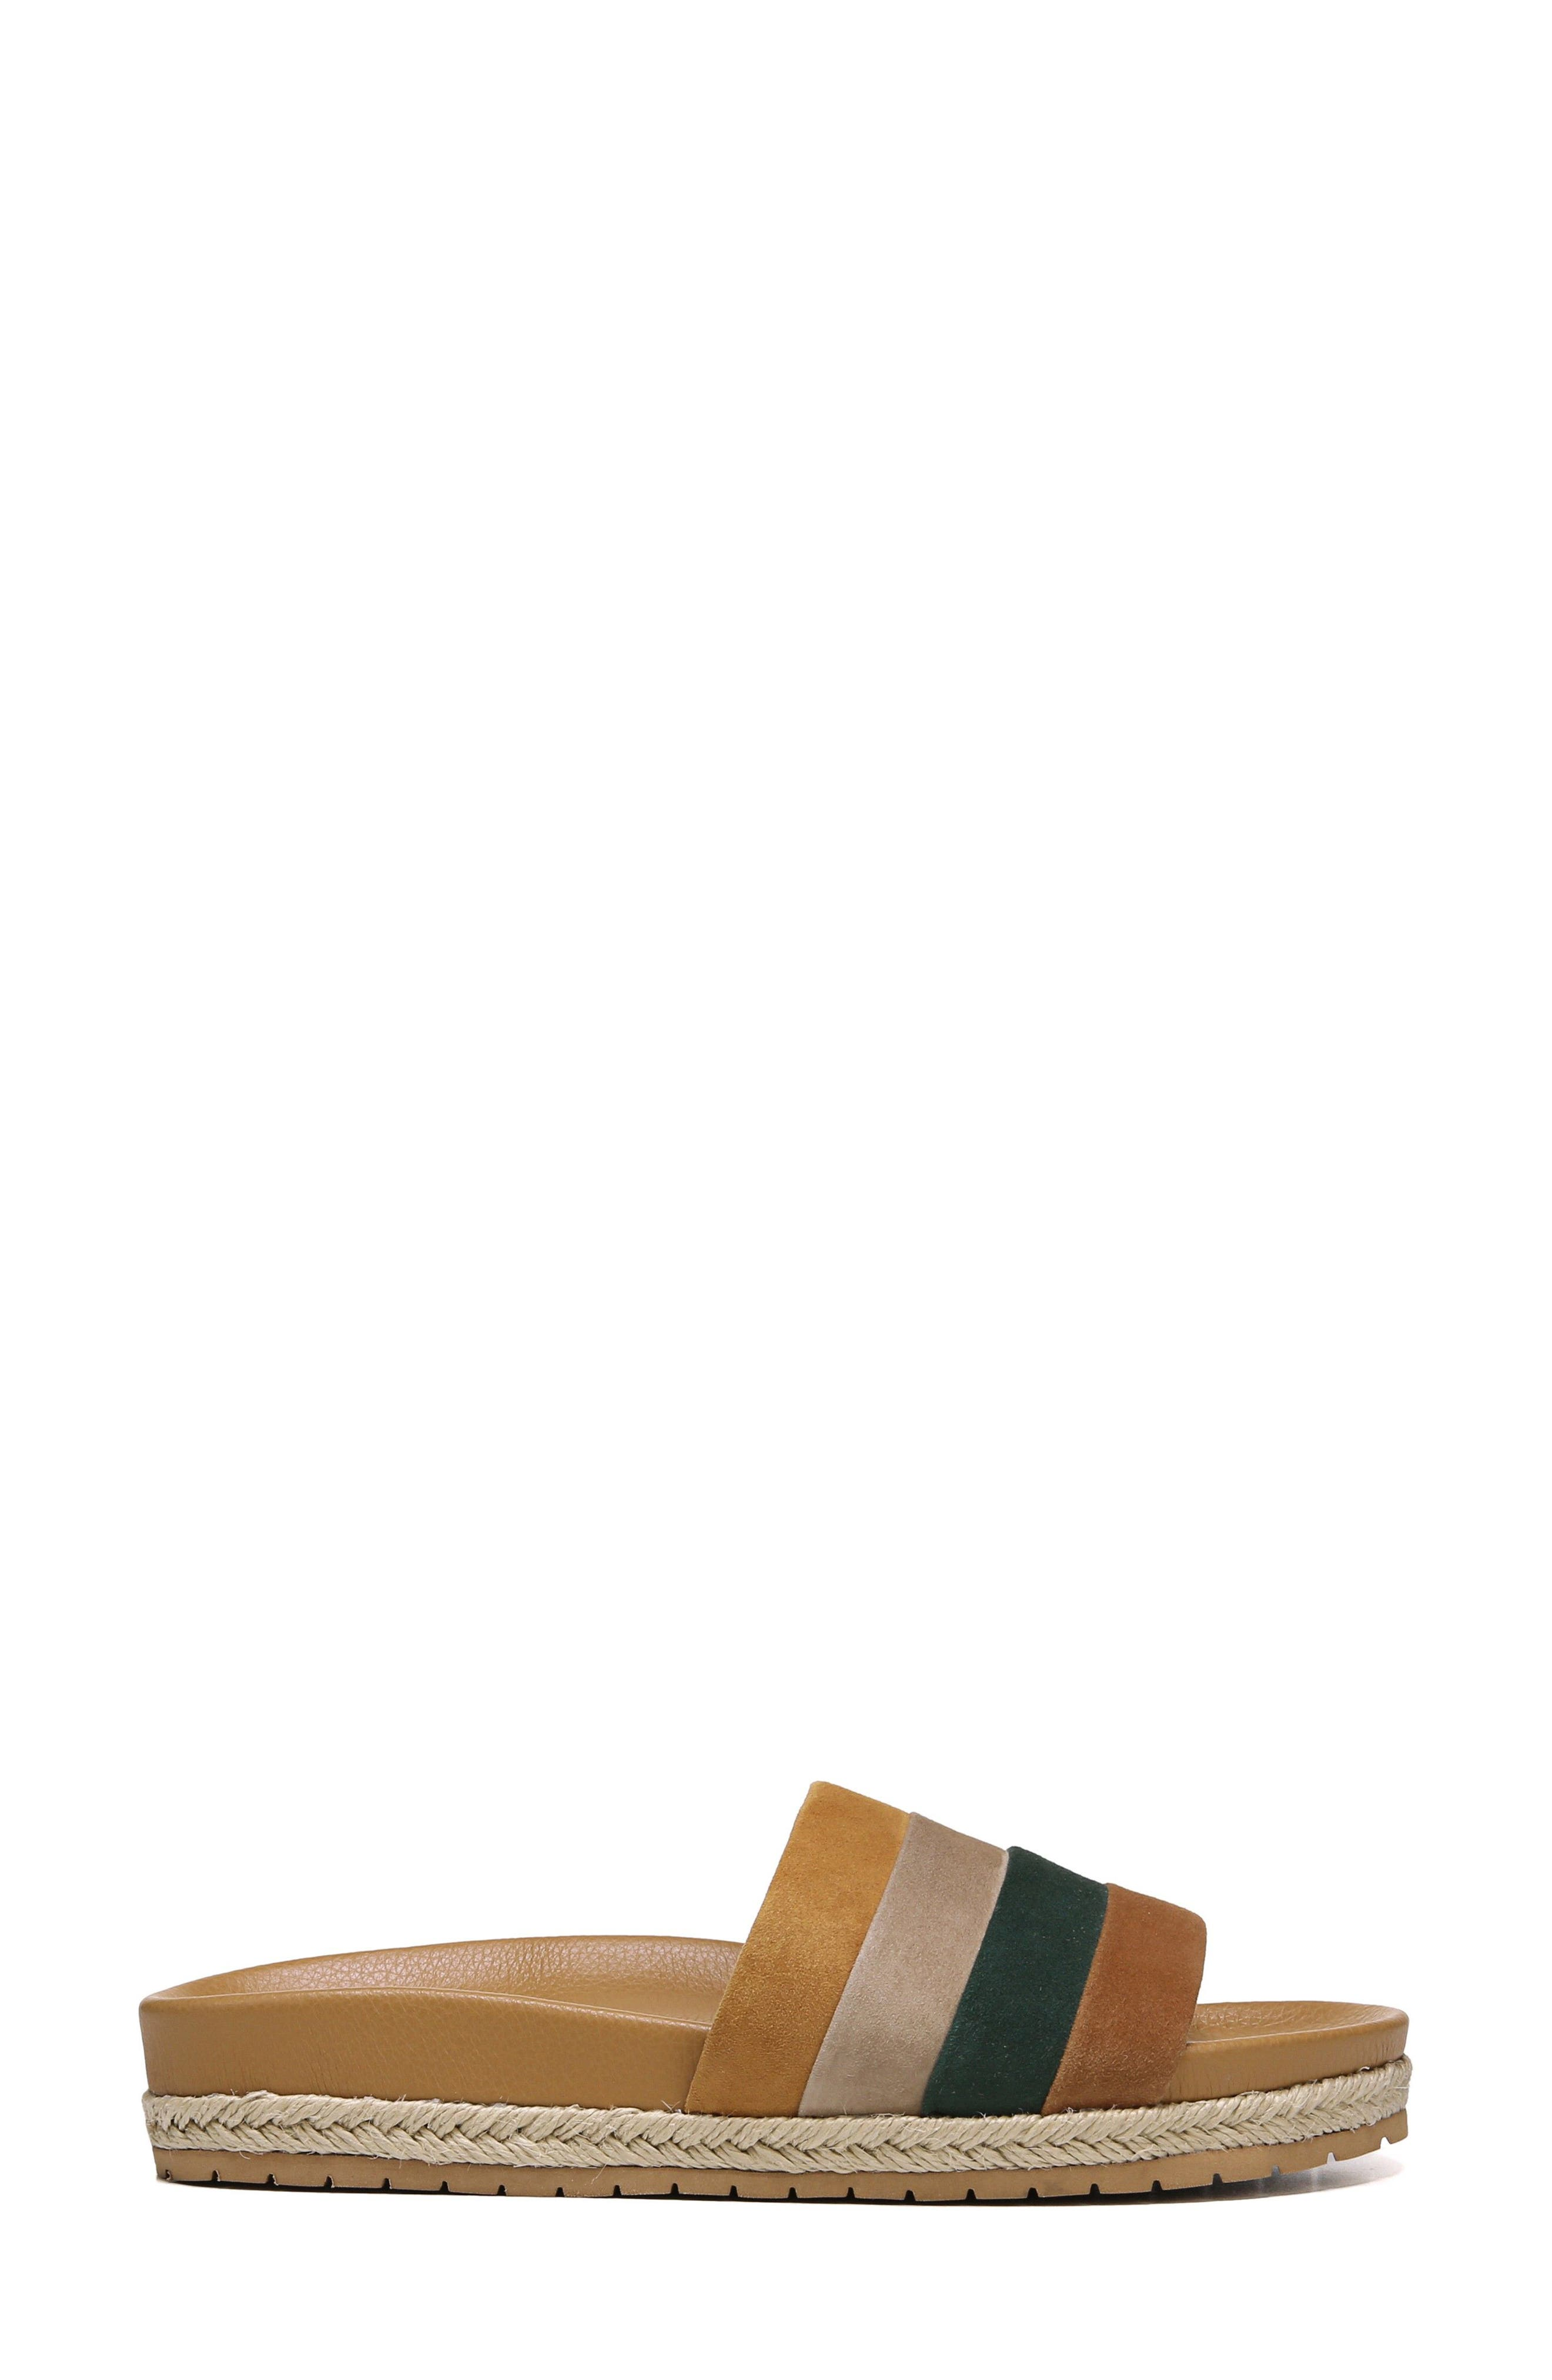 Alisa Striped Slide Sandal,                             Alternate thumbnail 3, color,                             Cedar Multi